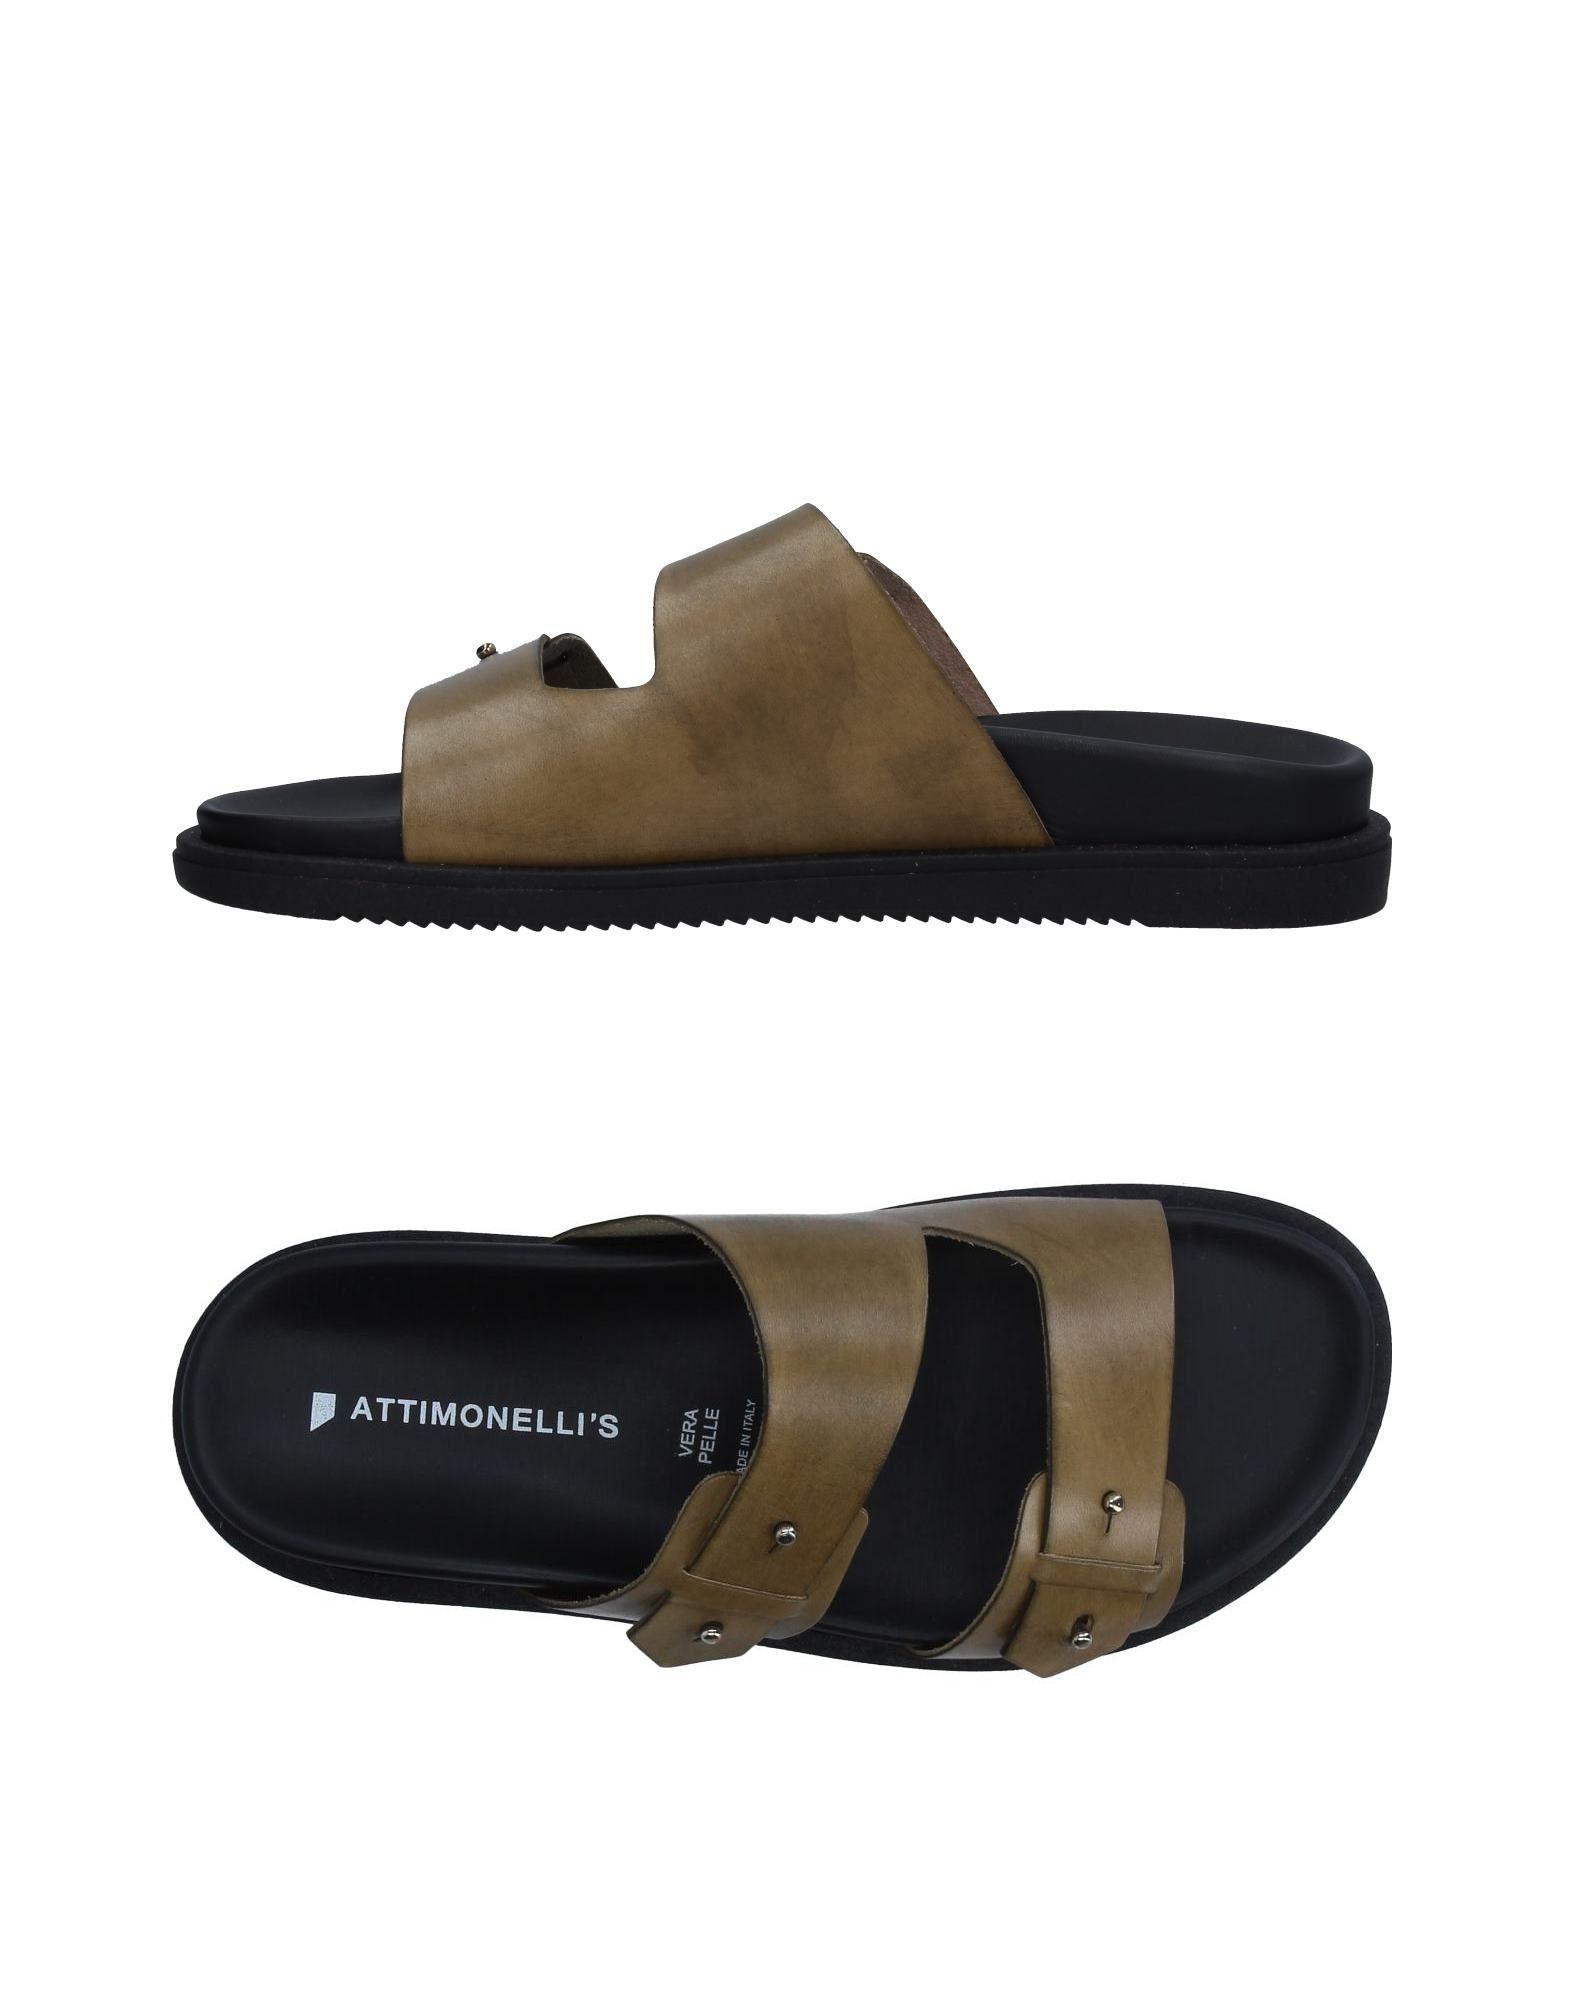 ФОТО attimonelli's сандалии